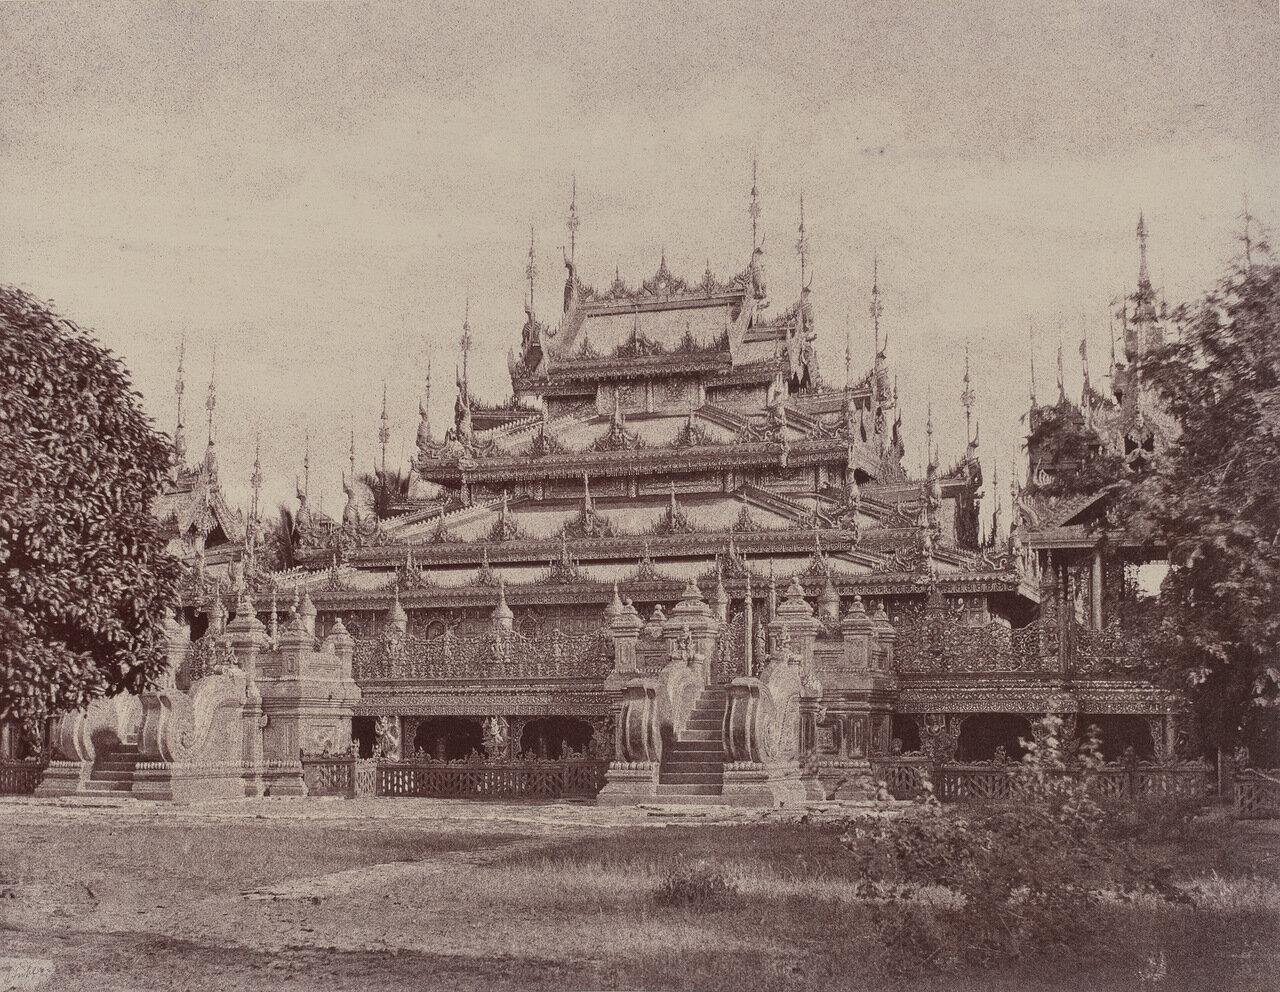 Амерапура. Maha-oung-meeay-liy-mhan Kyoung